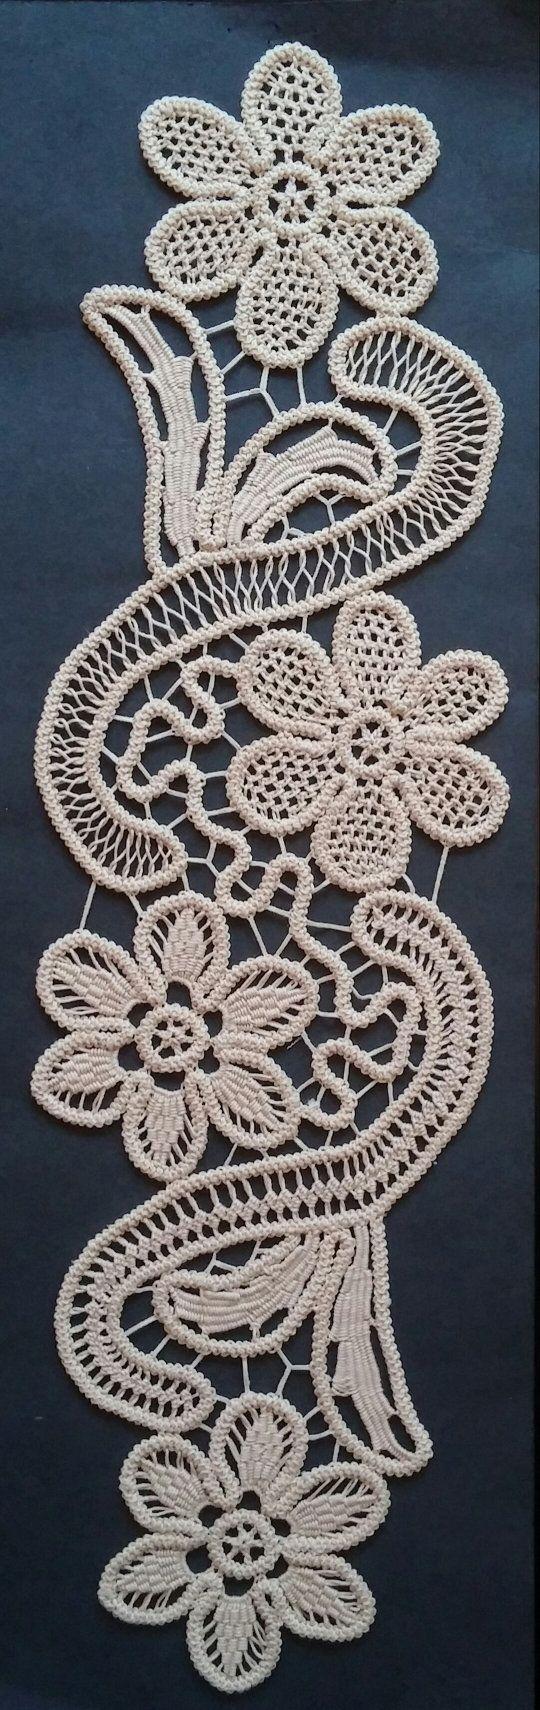 Point Lace Romanian Style Crochet Doily Tan Floral by ValeriasShop